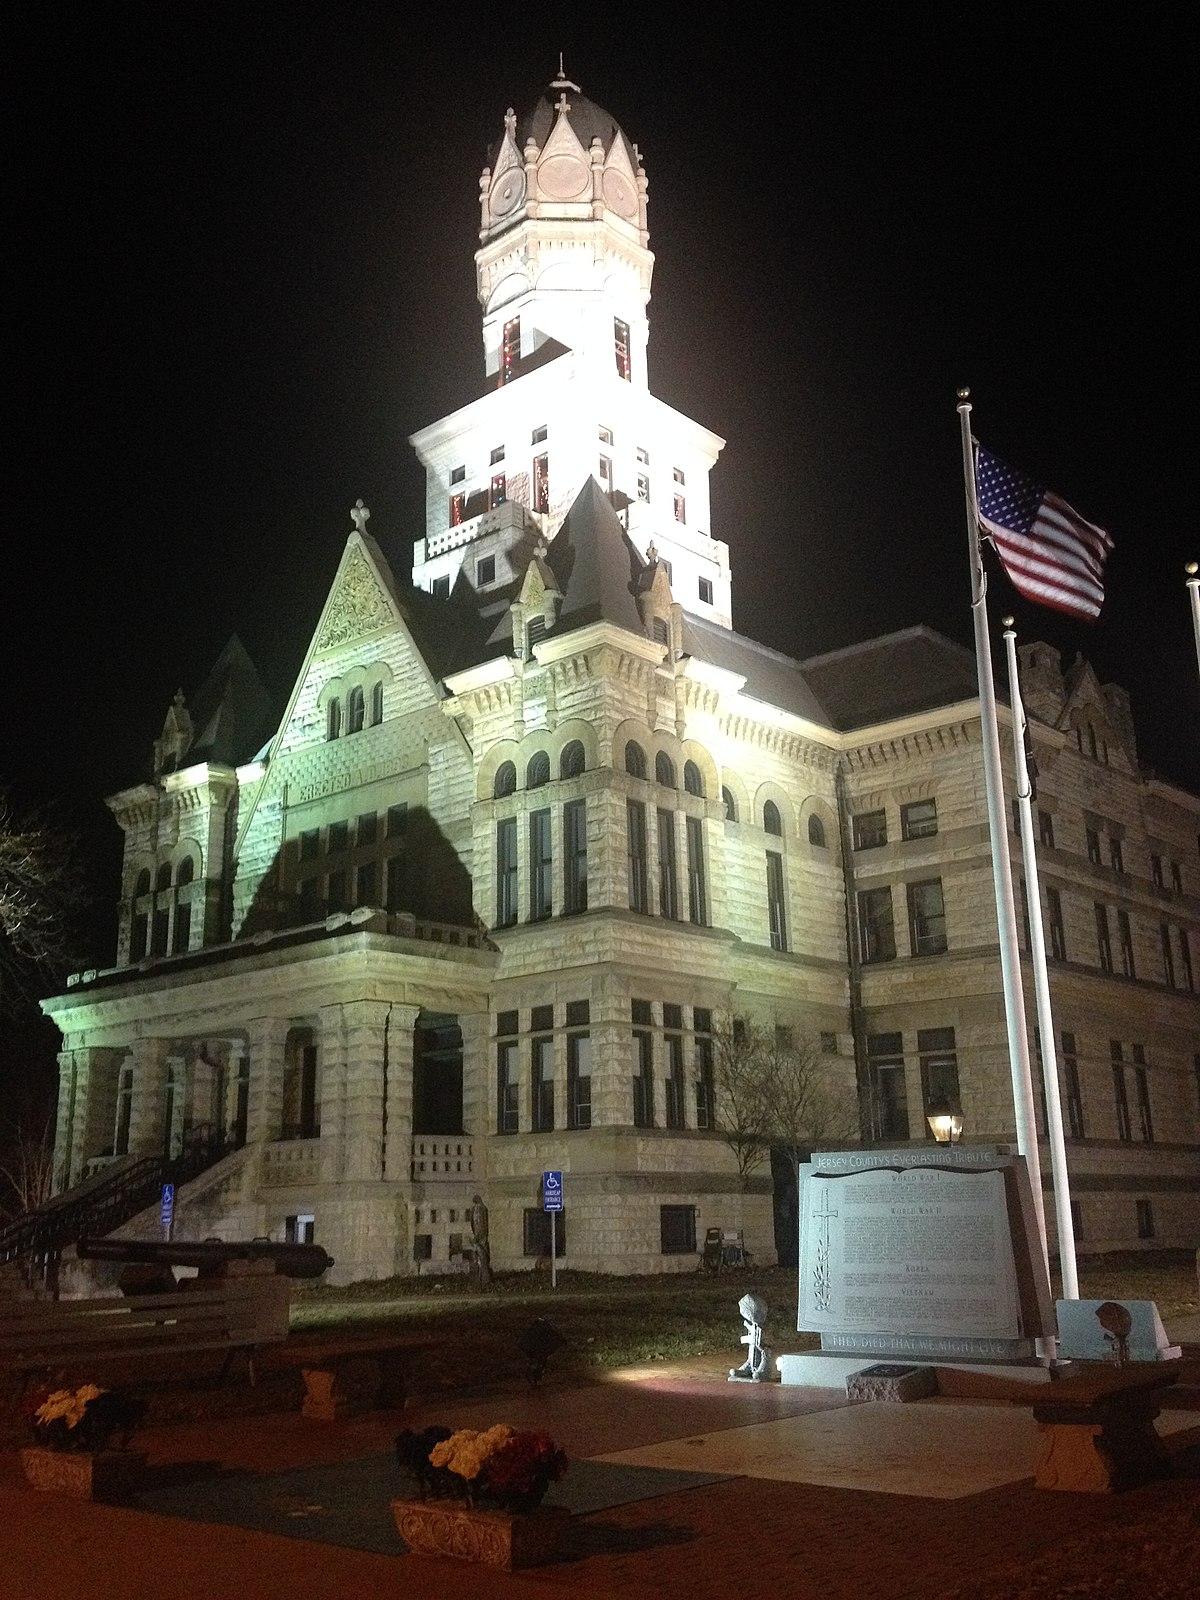 Illinois/macoupin county/brighton - Illinois/macoupin County/brighton 73